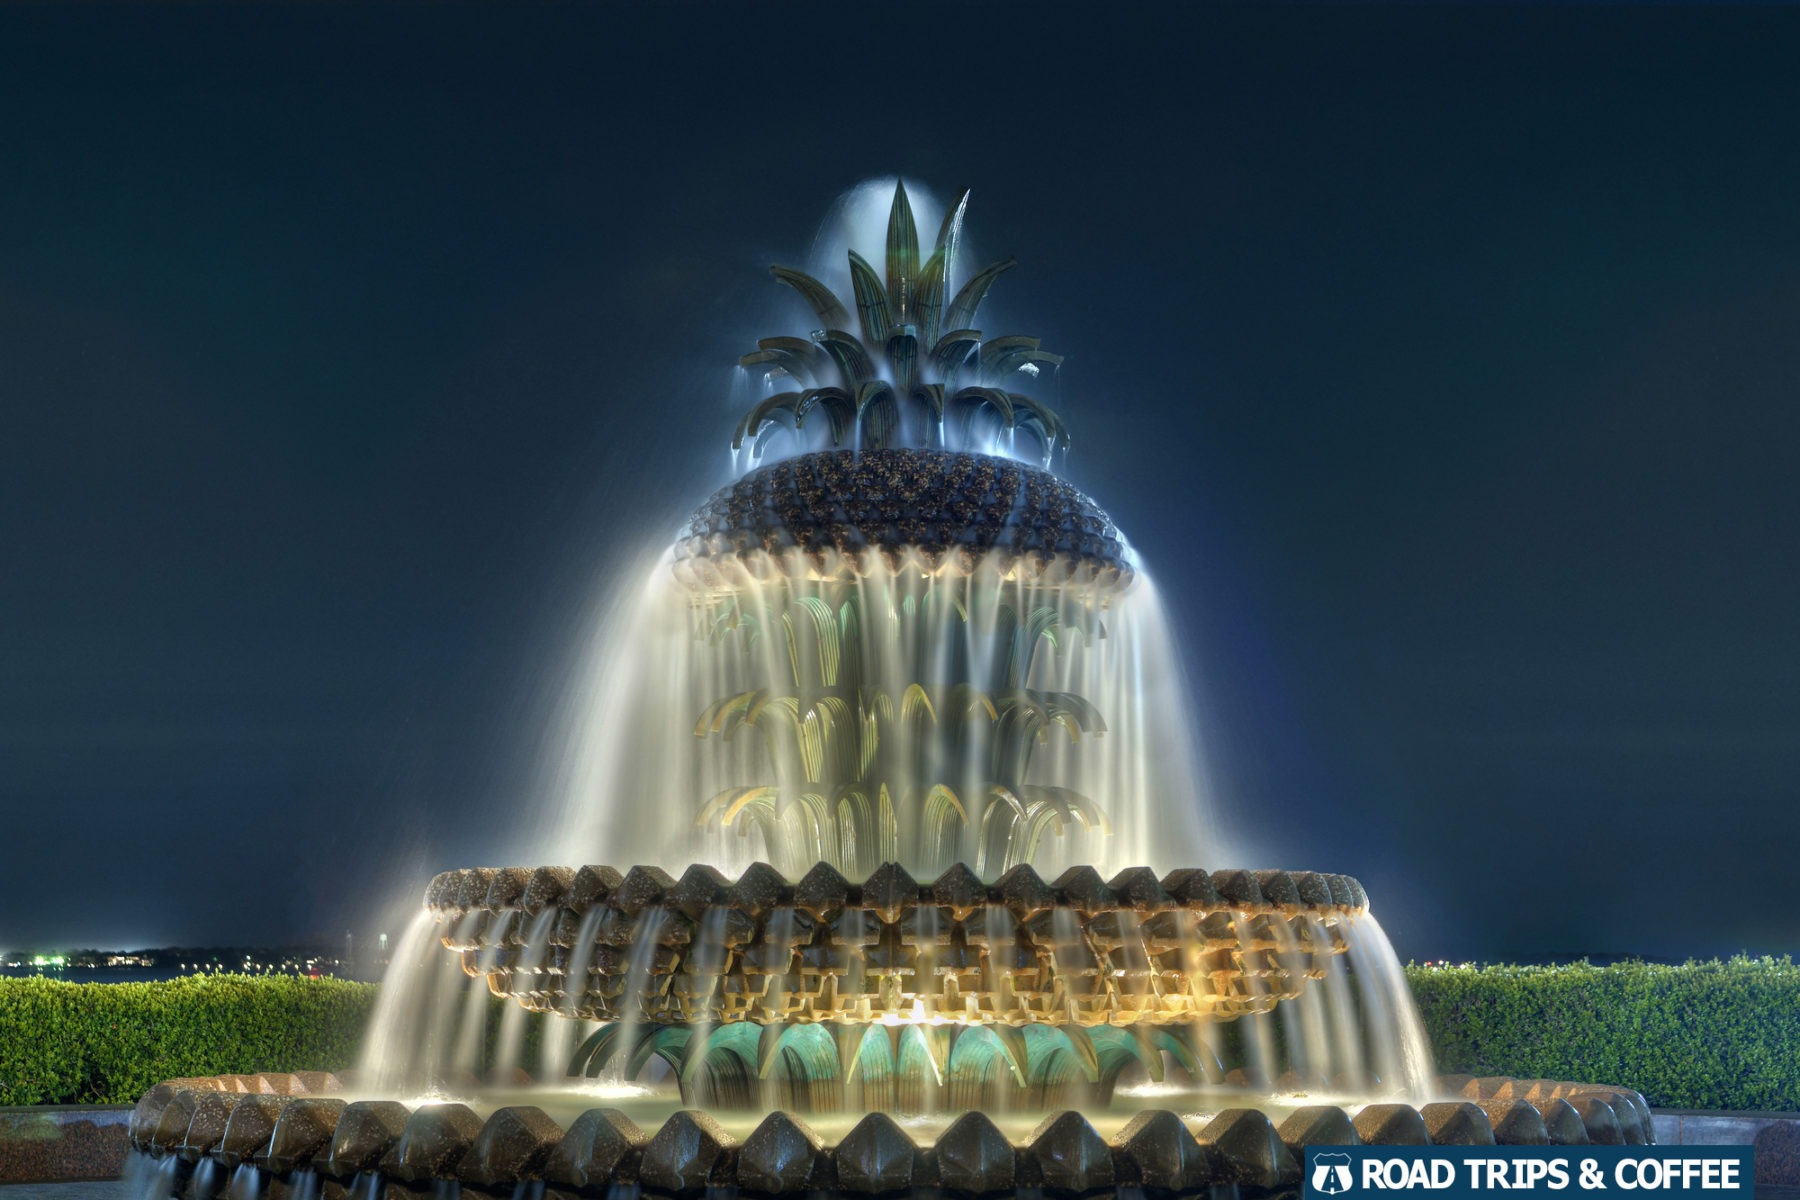 The Pineapple Water Fountain at night in Charleston, South Carolina